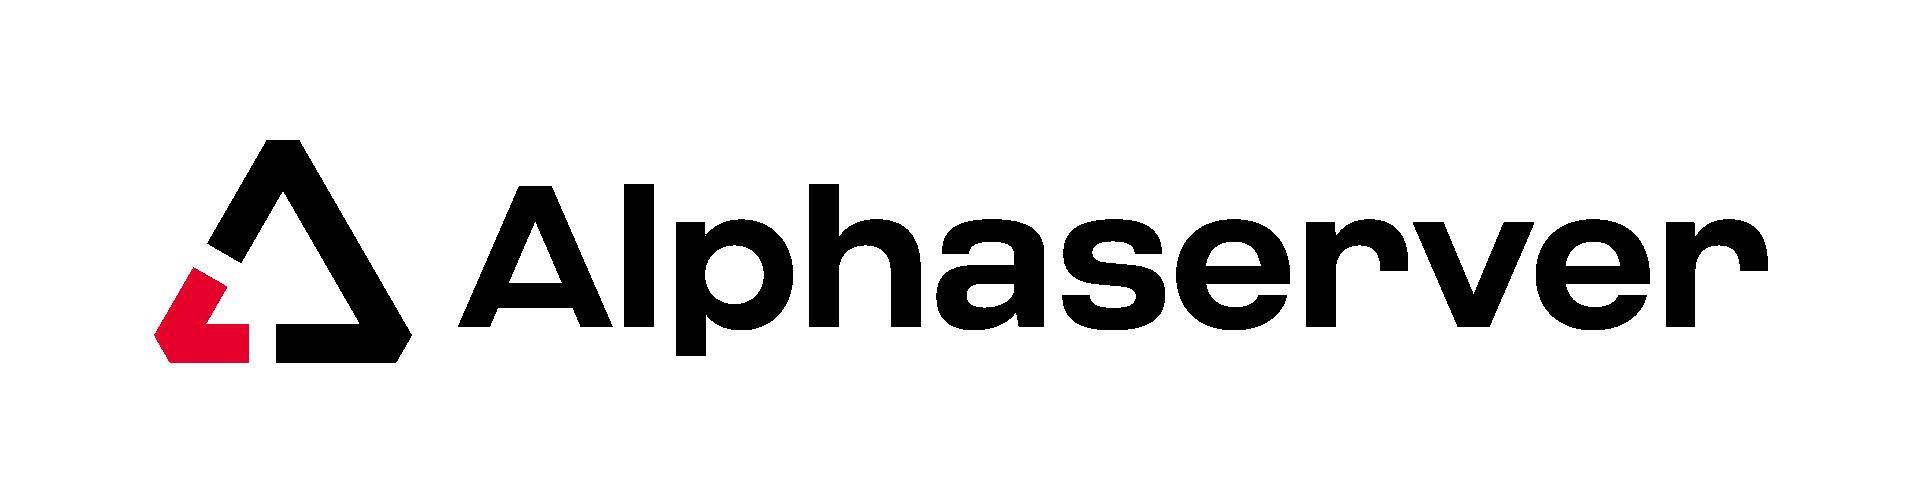 Alphaserver.cz Logo